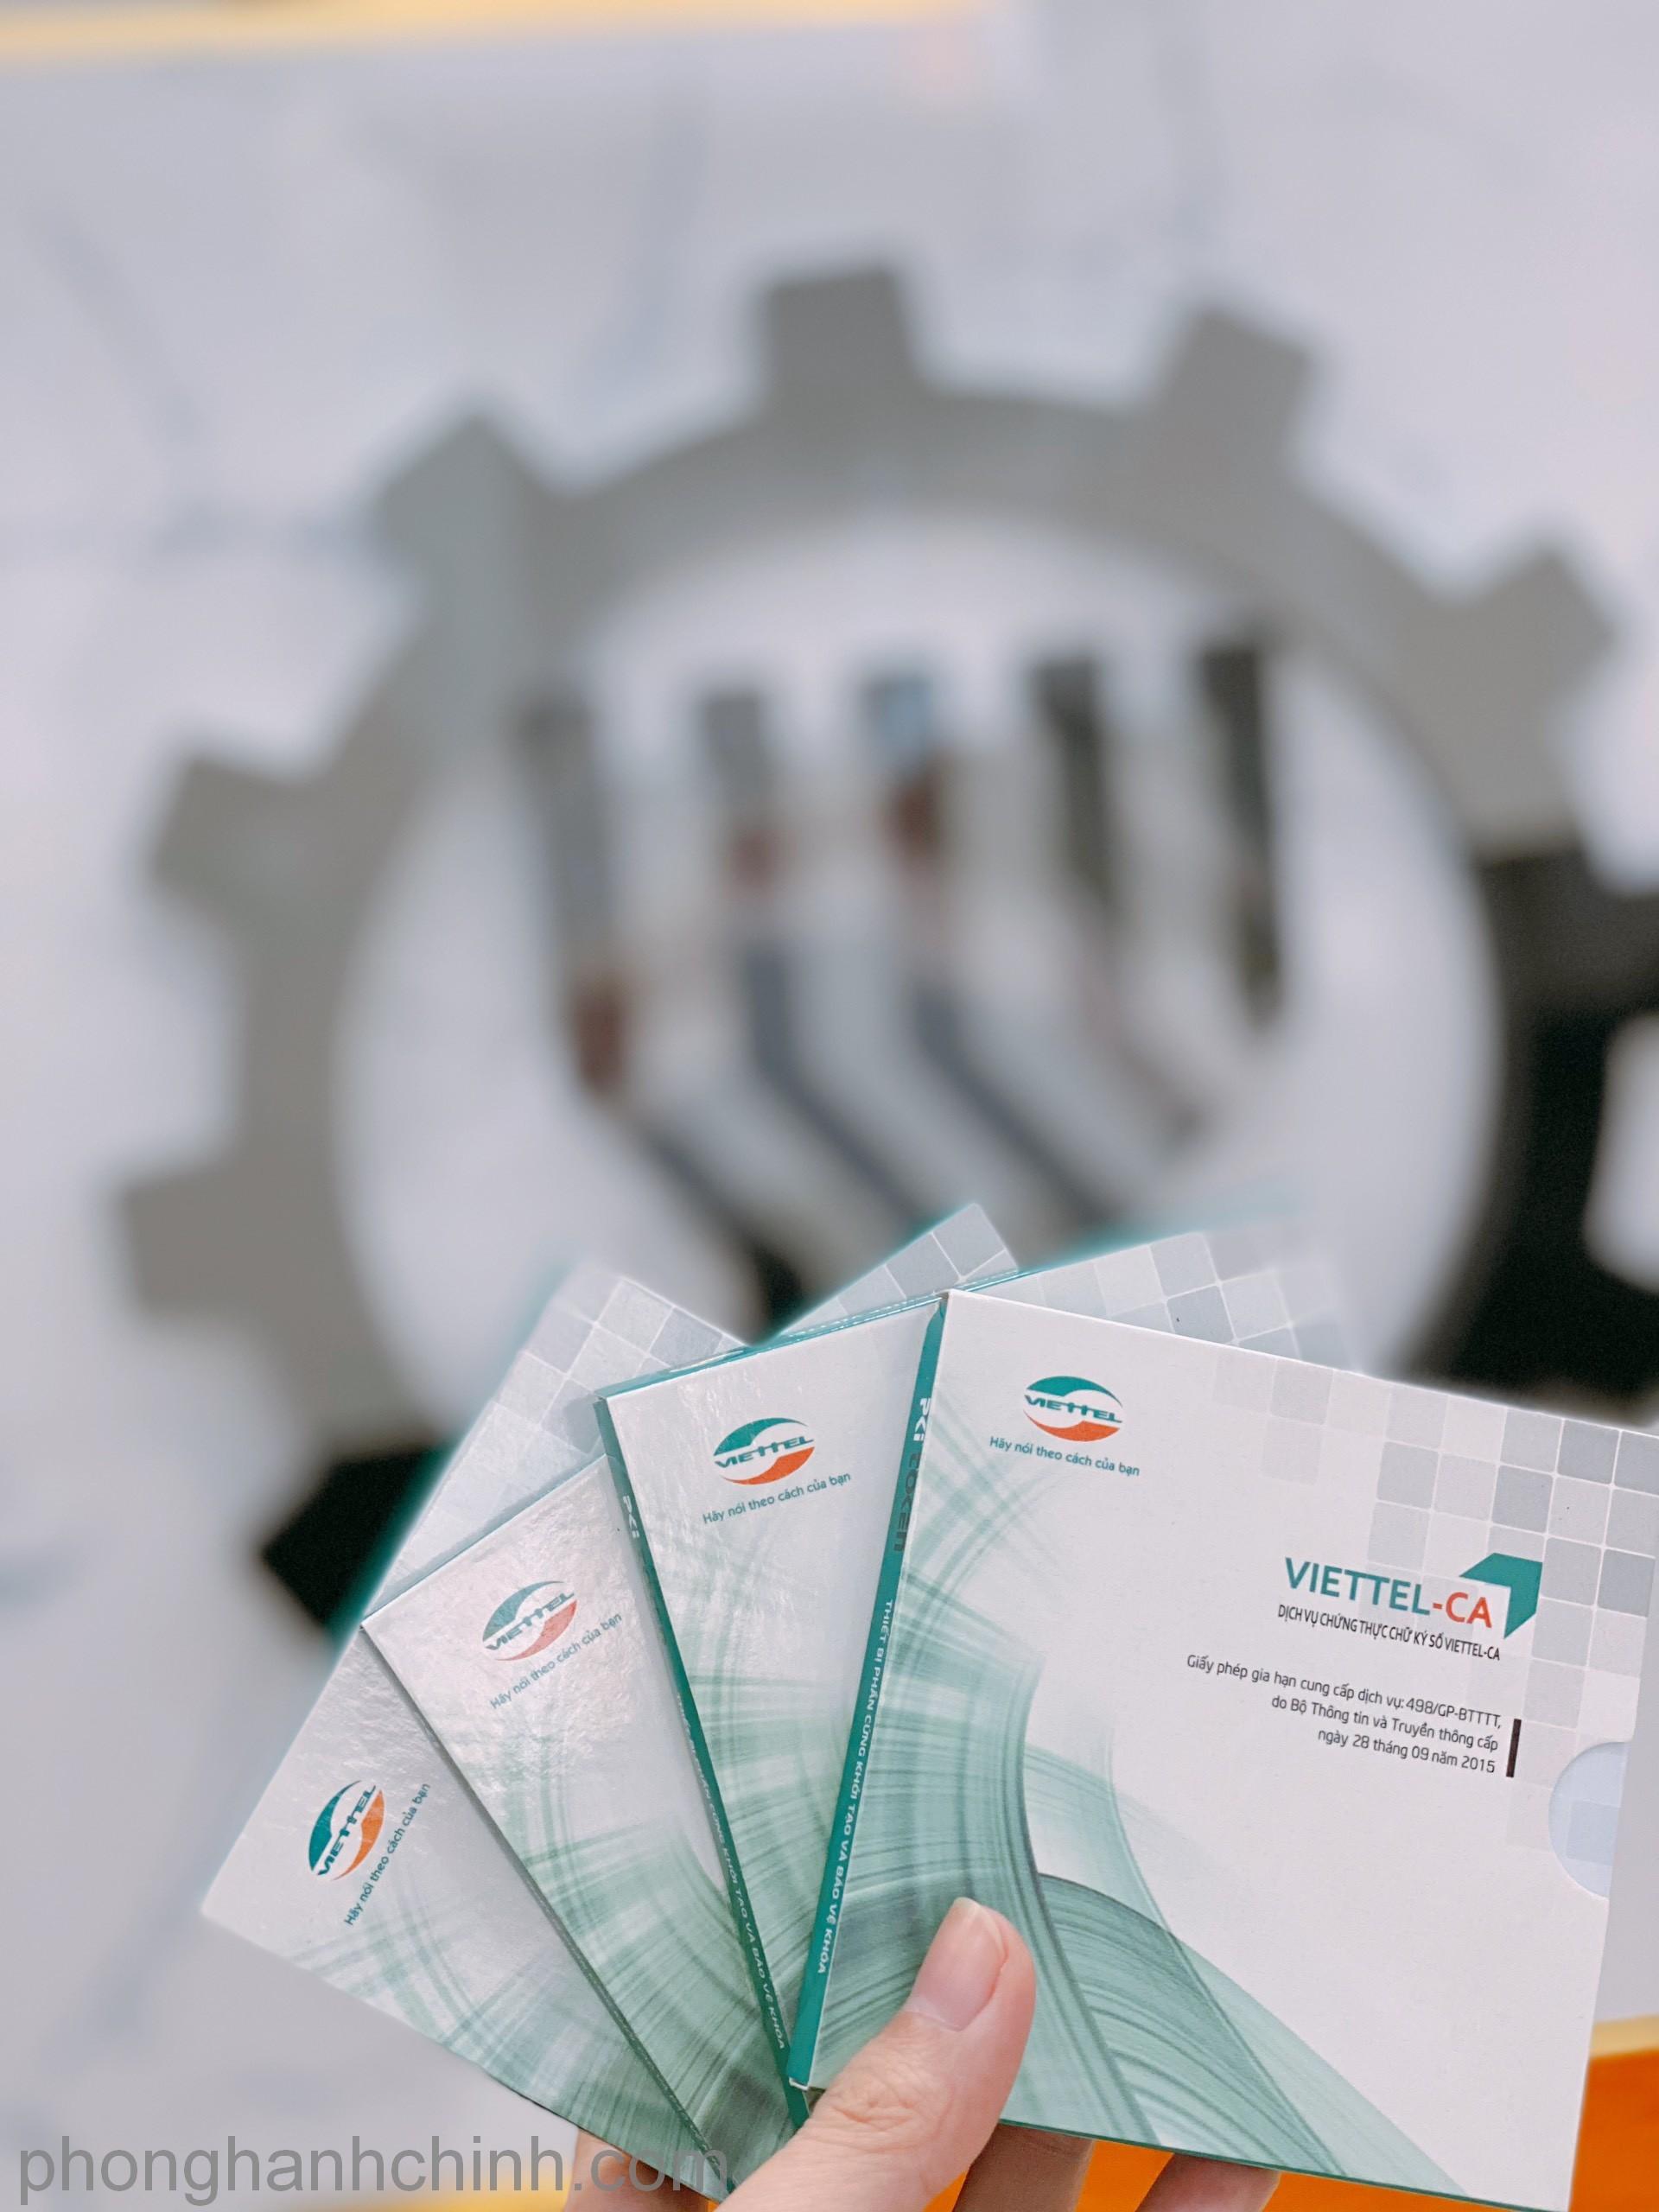 Chữ ký số Viiettel-CA